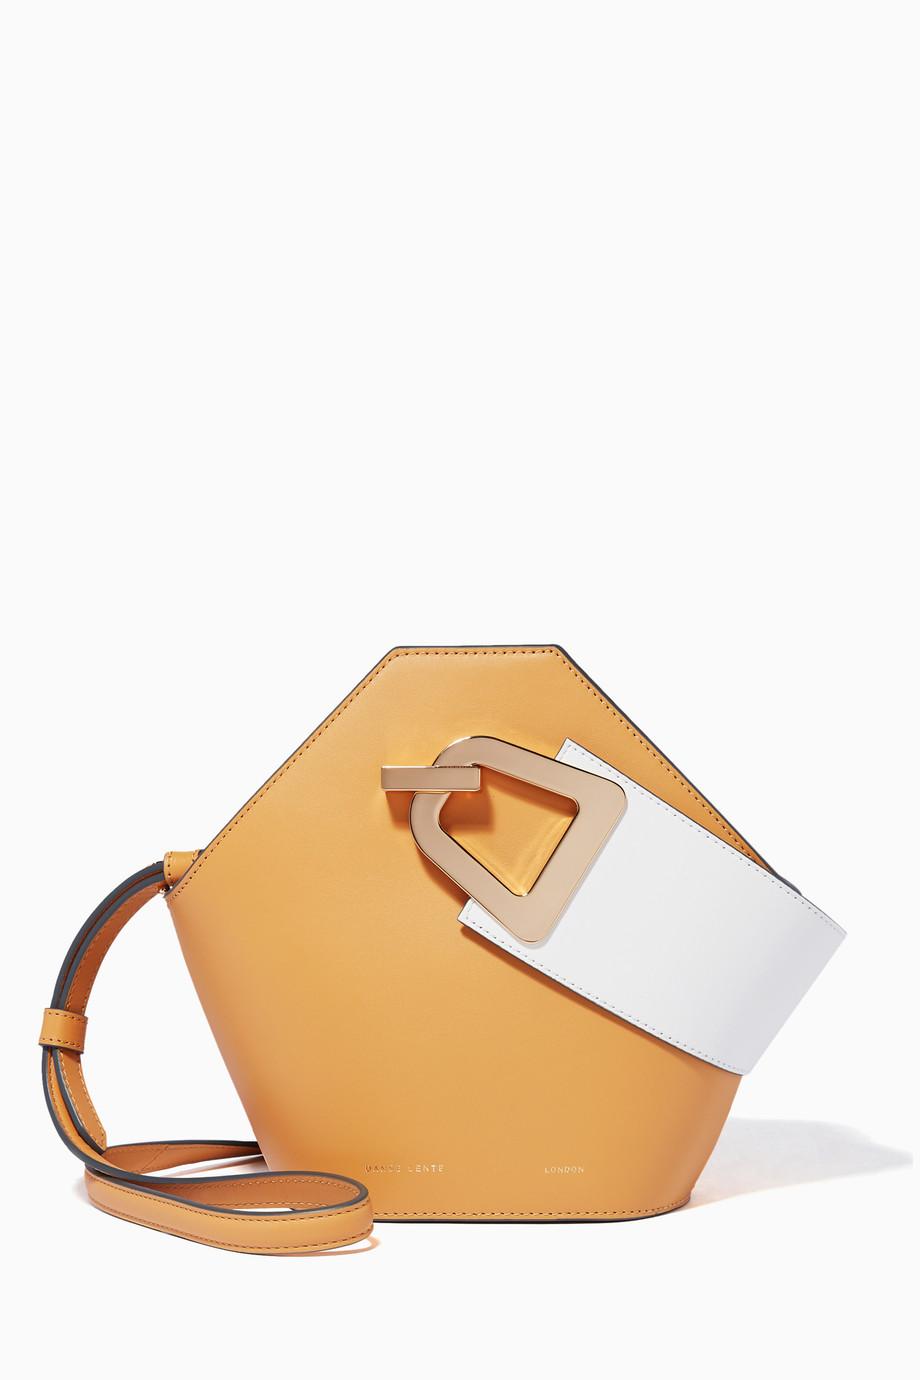 7102b22e6fd Shop Danse Lente Neutral Beige Leather Mini Johnny Bucket Bag for ...